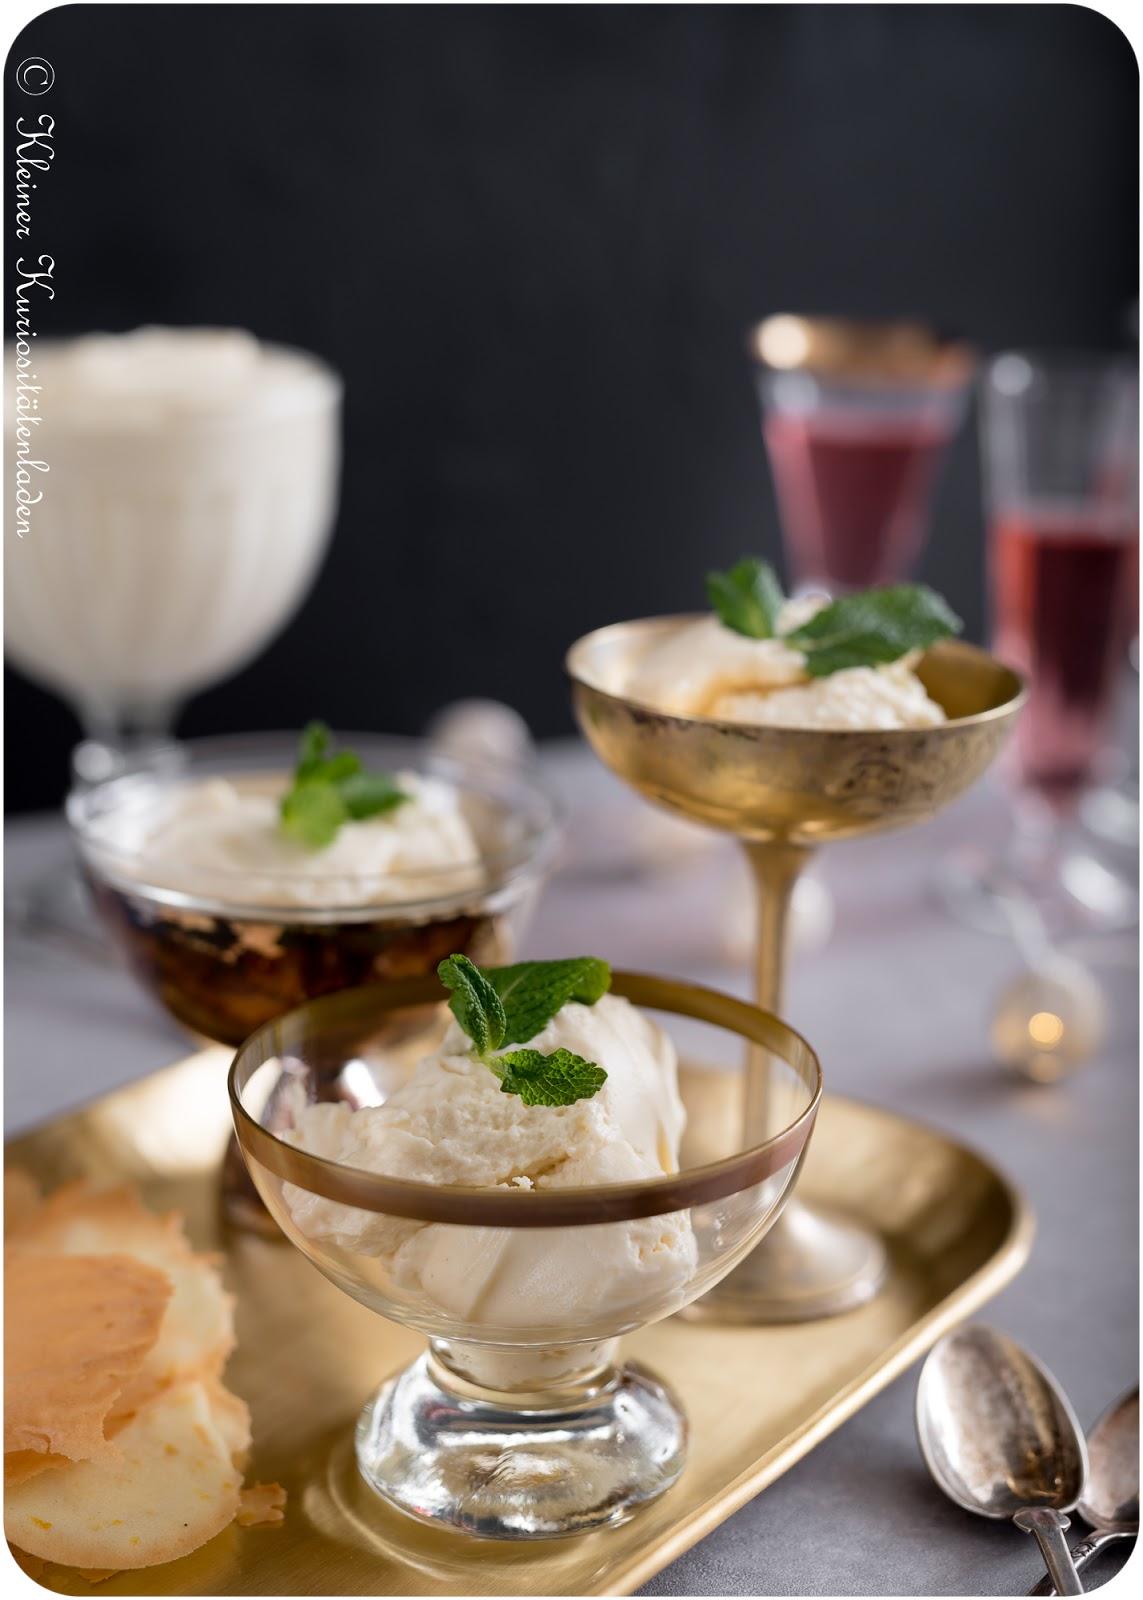 Mousse au Chocolat blanc | Orangen-Hippe